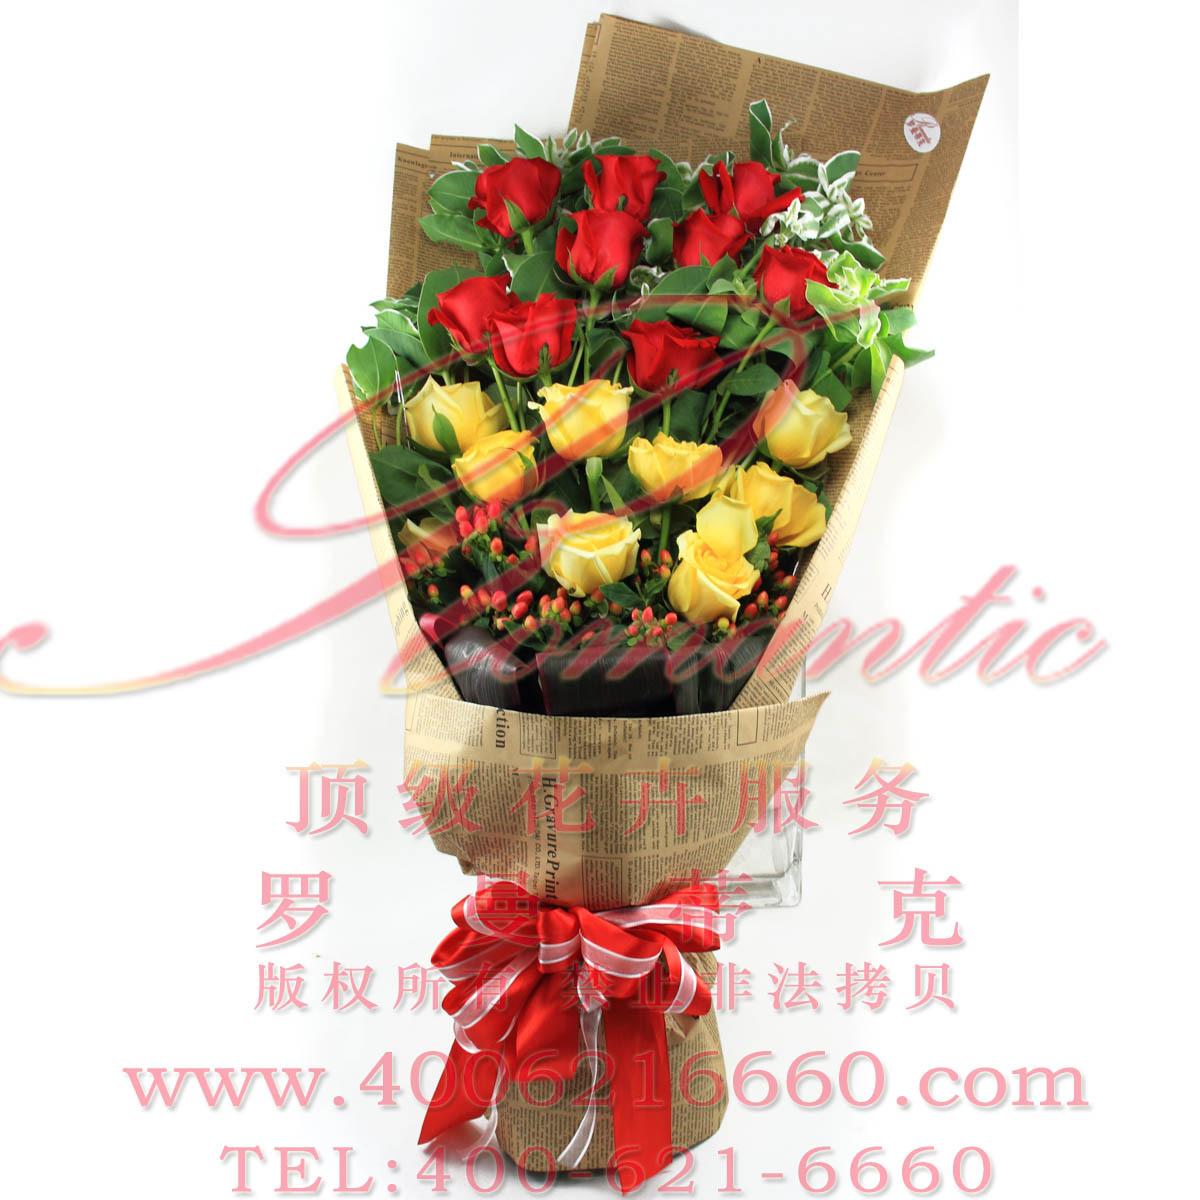 h787丘比特小夜曲|20红玫瑰黄玫瑰英文报纸包装|爱情花束|纪念日图片